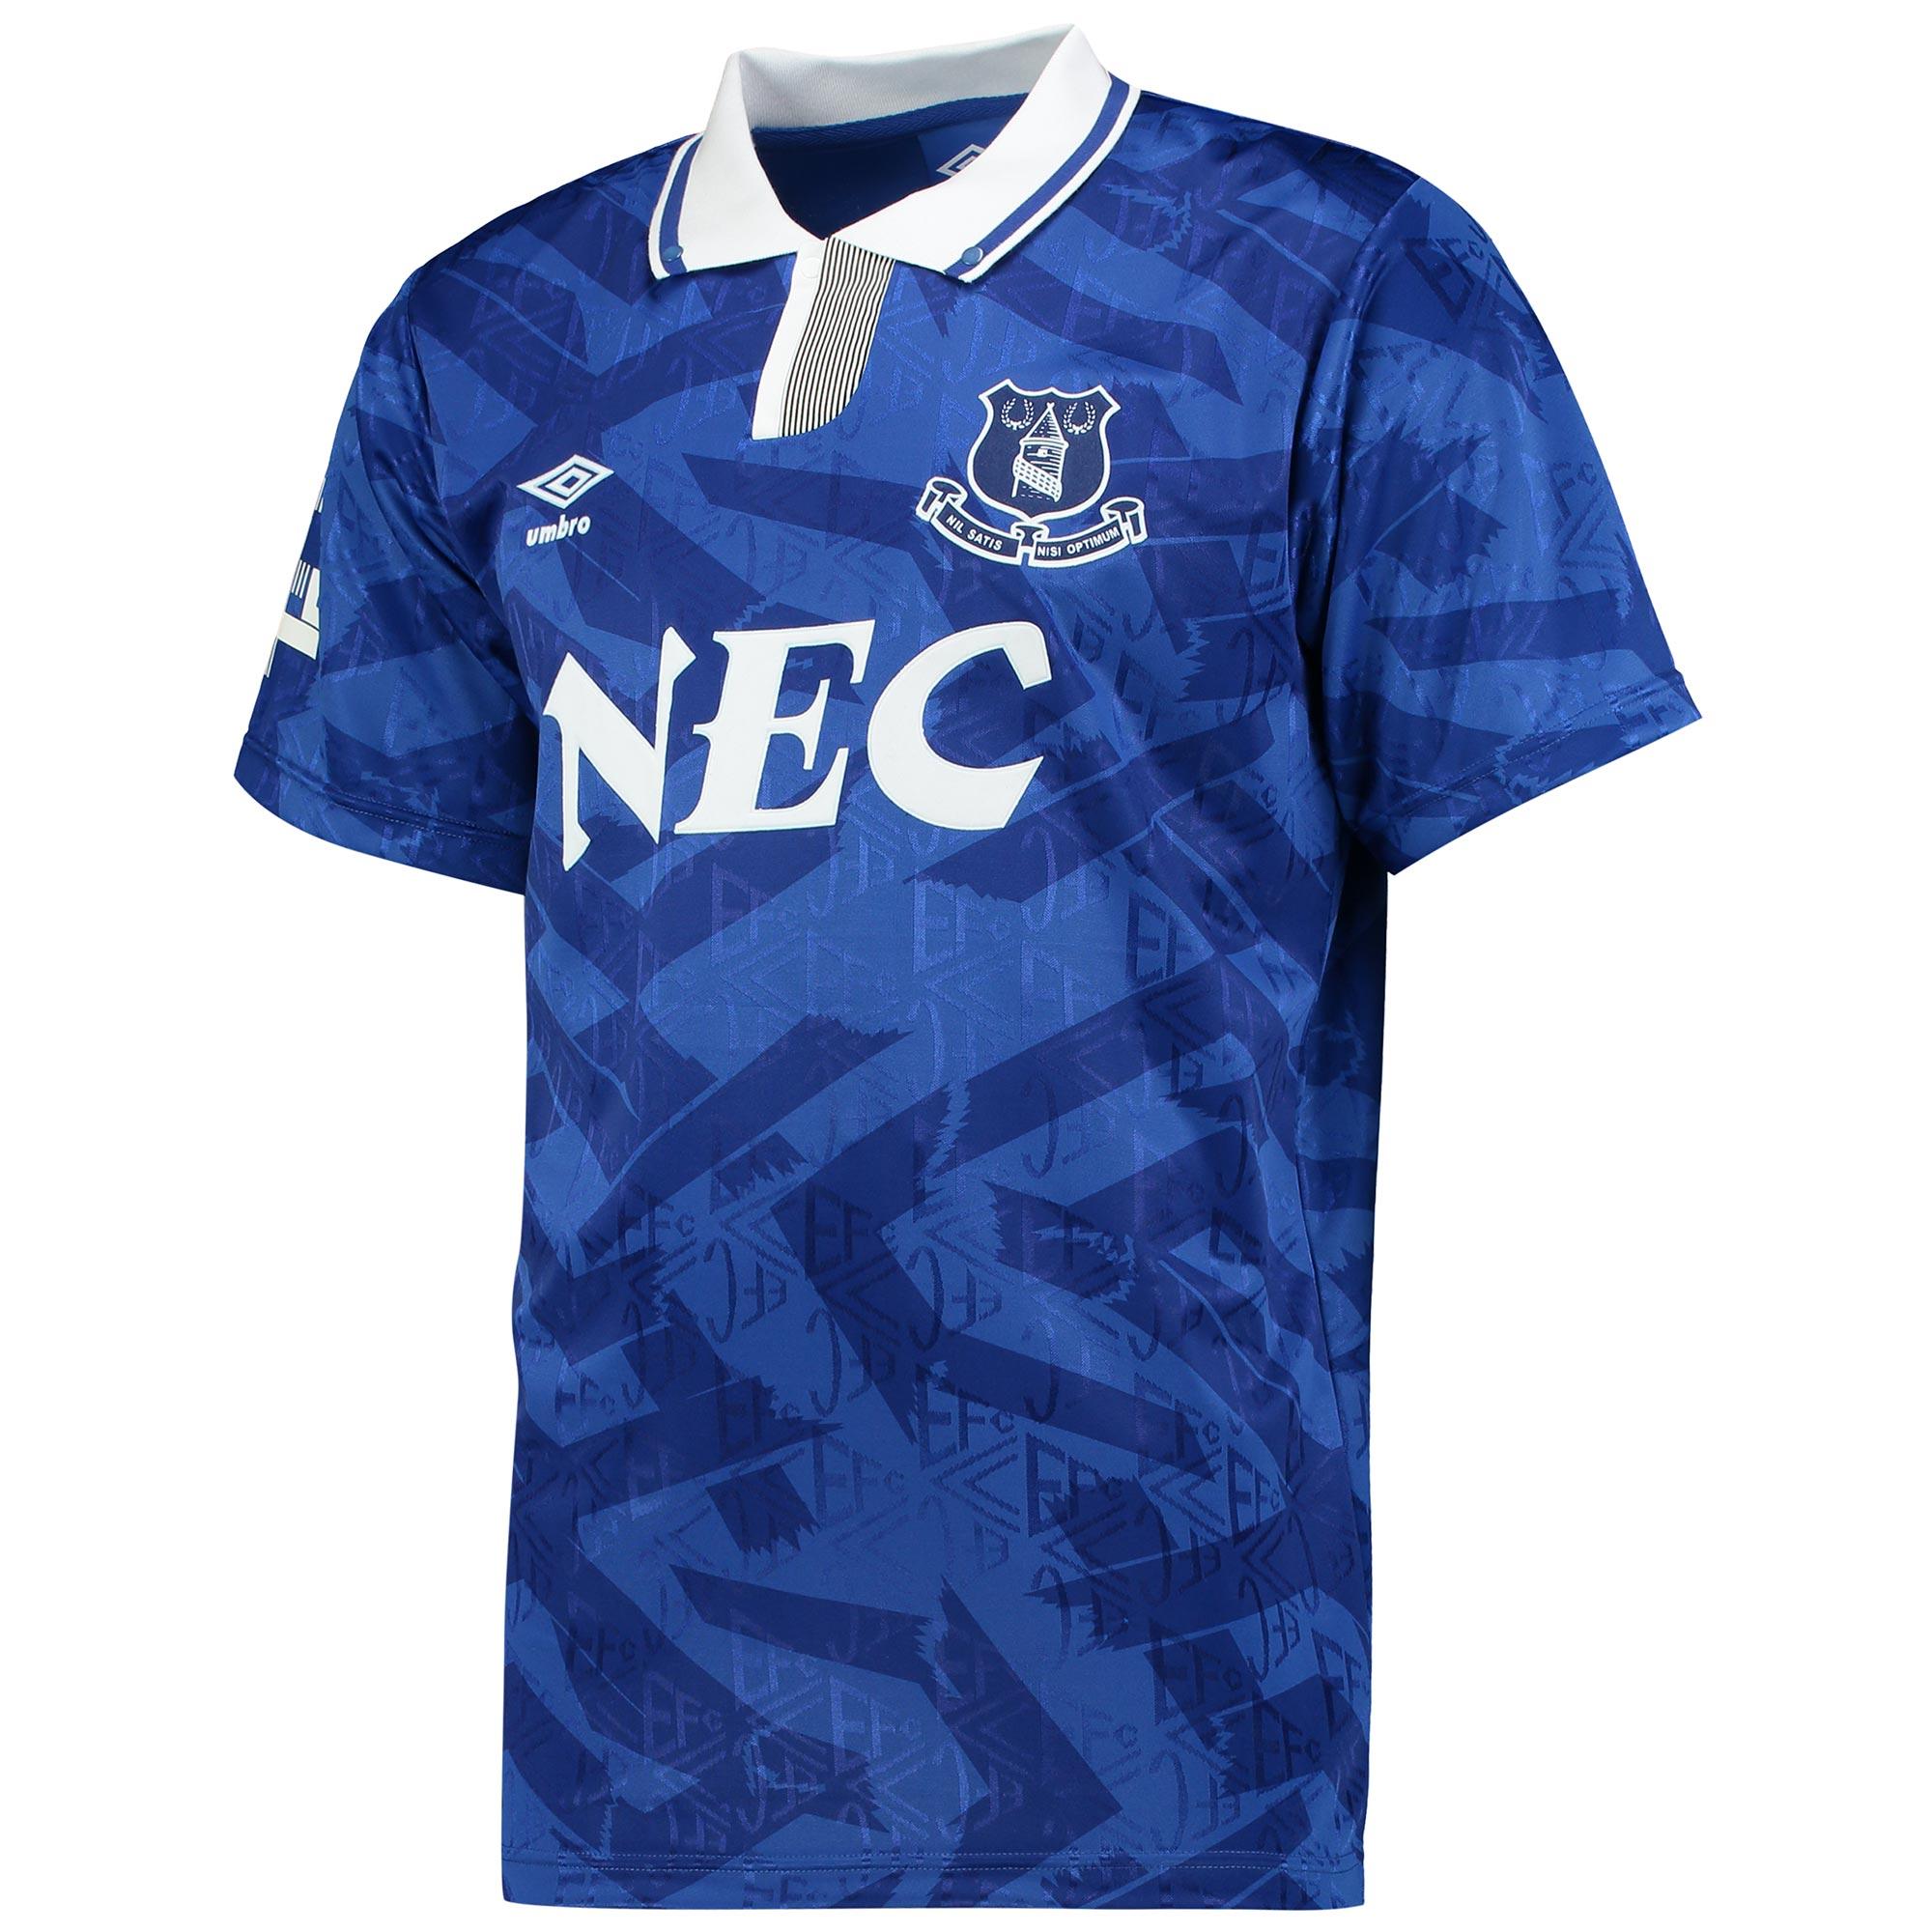 Image of Everton 1992 Home Shirt